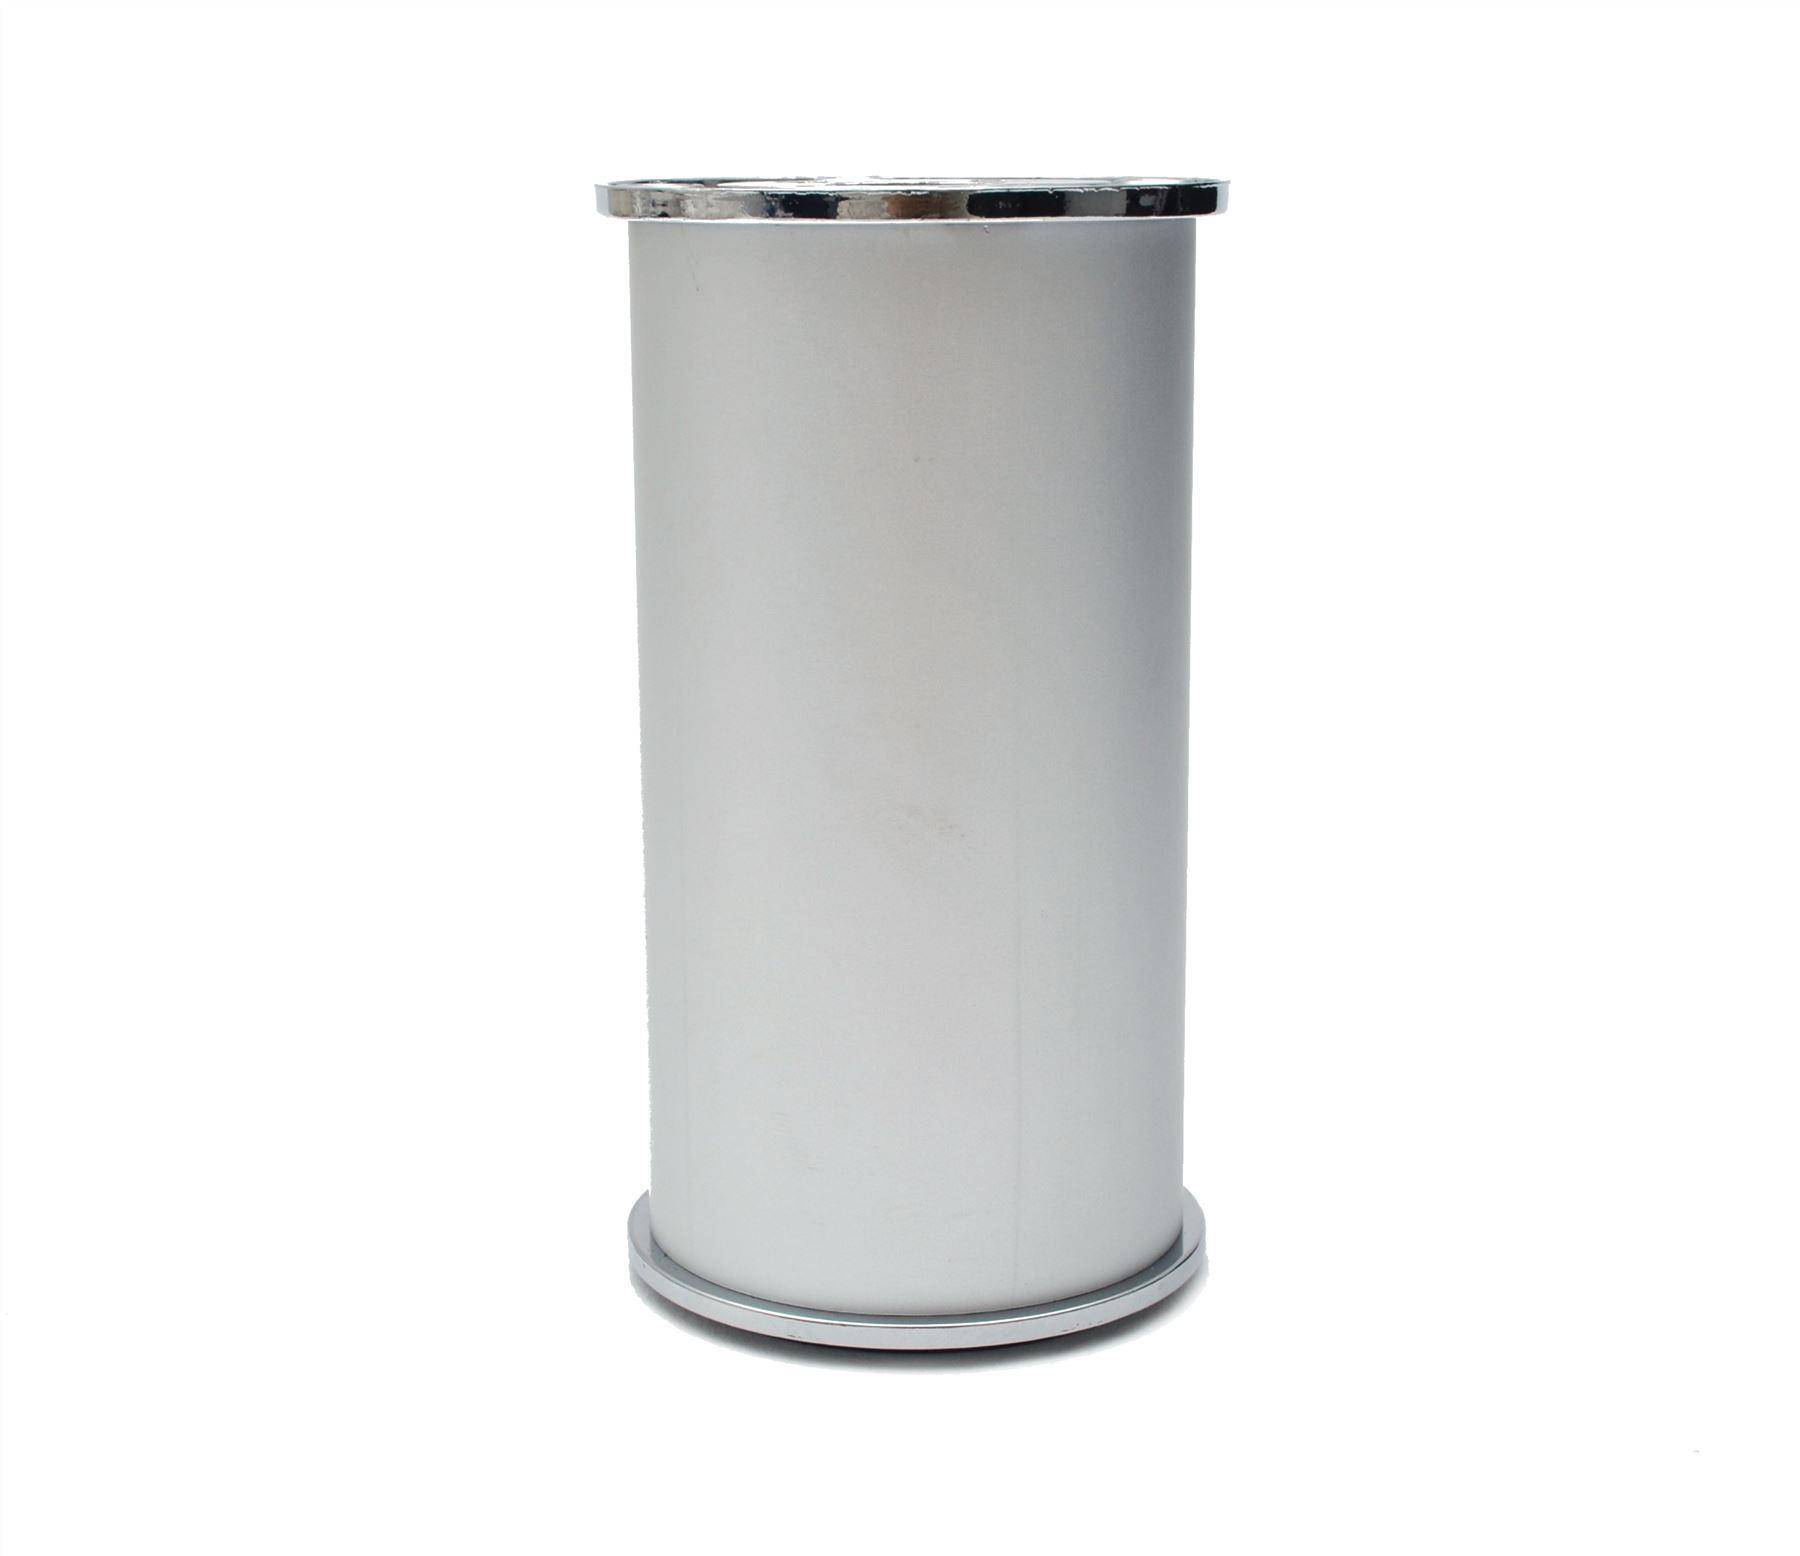 Aluminium Feet / Plinth Legs cupboard cabinets Kitchen furniture | eBay